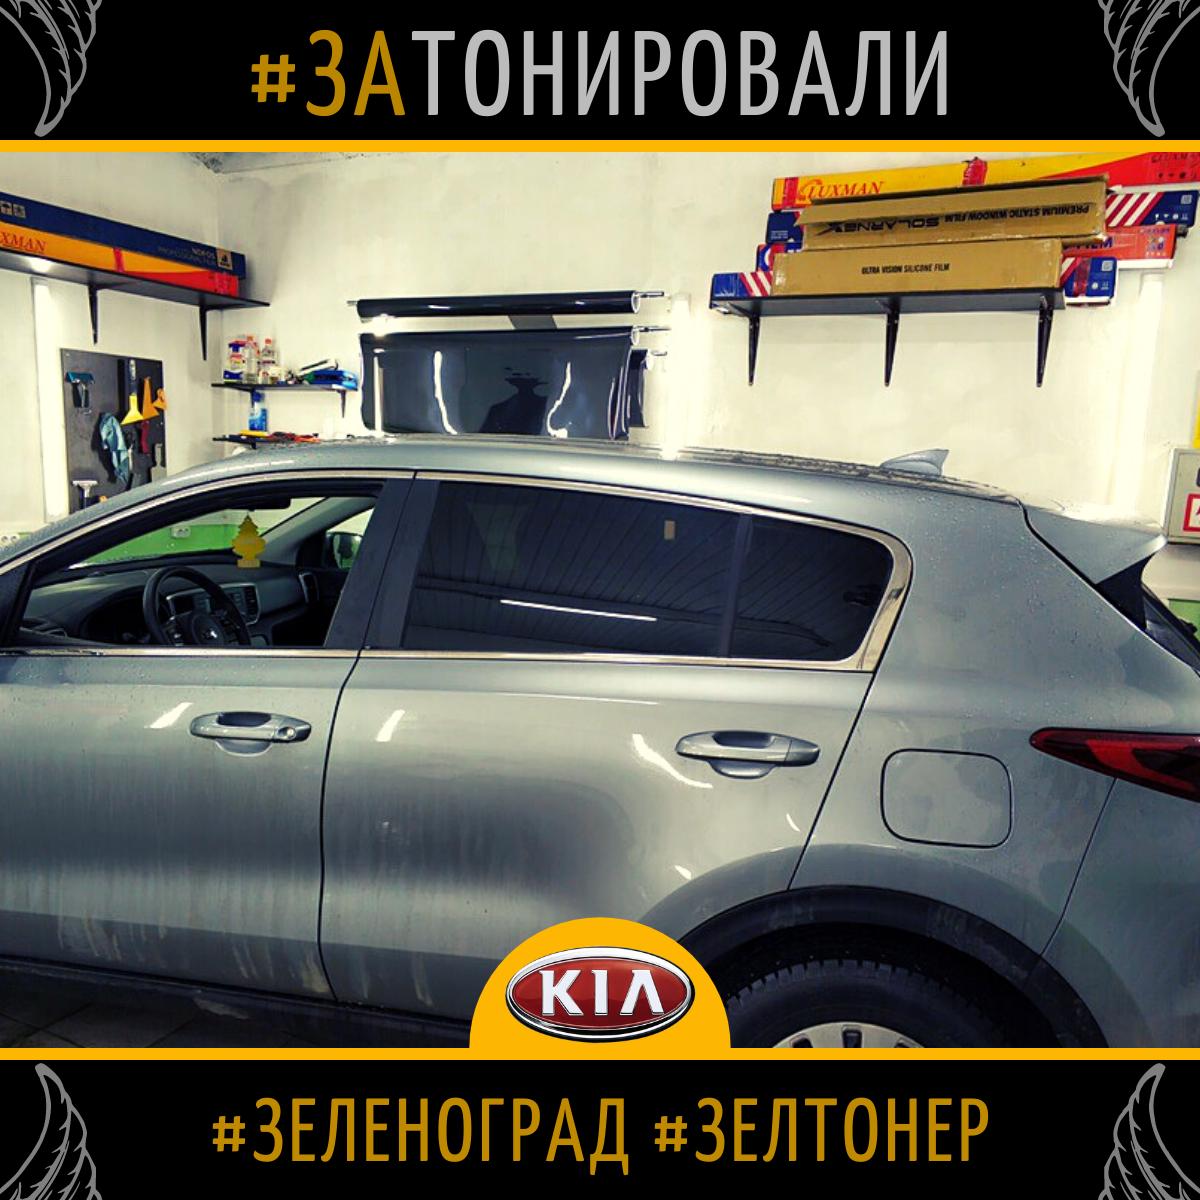 Тонировка KIA Sportage.